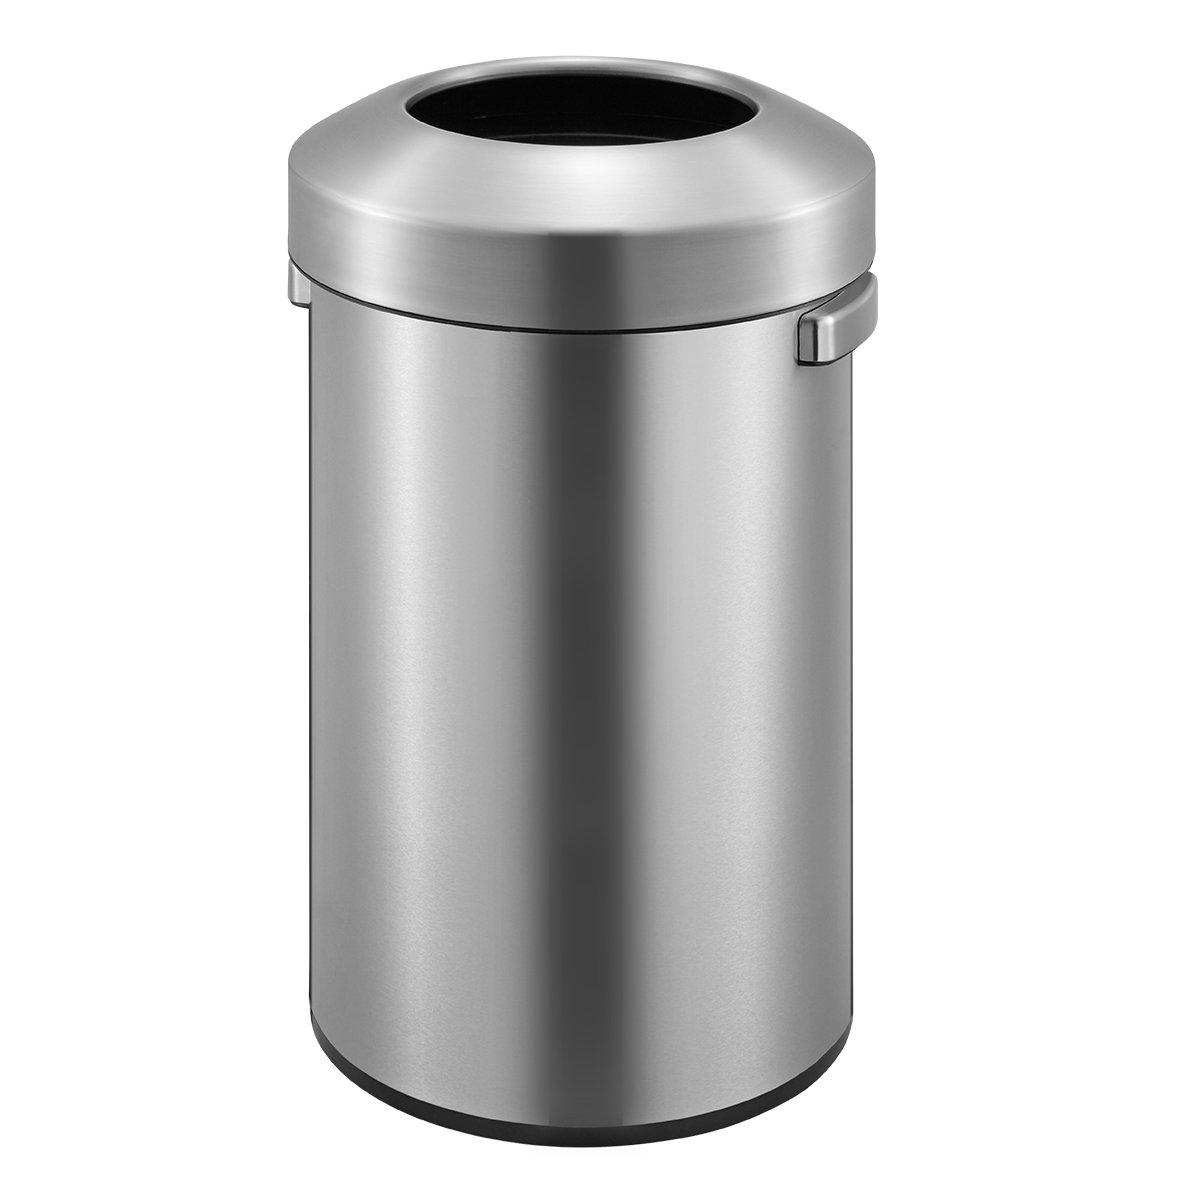 EKO EK9055-60L Urban Commercial Open Top Trash Can, Stainless Steel, 60 L by EKO